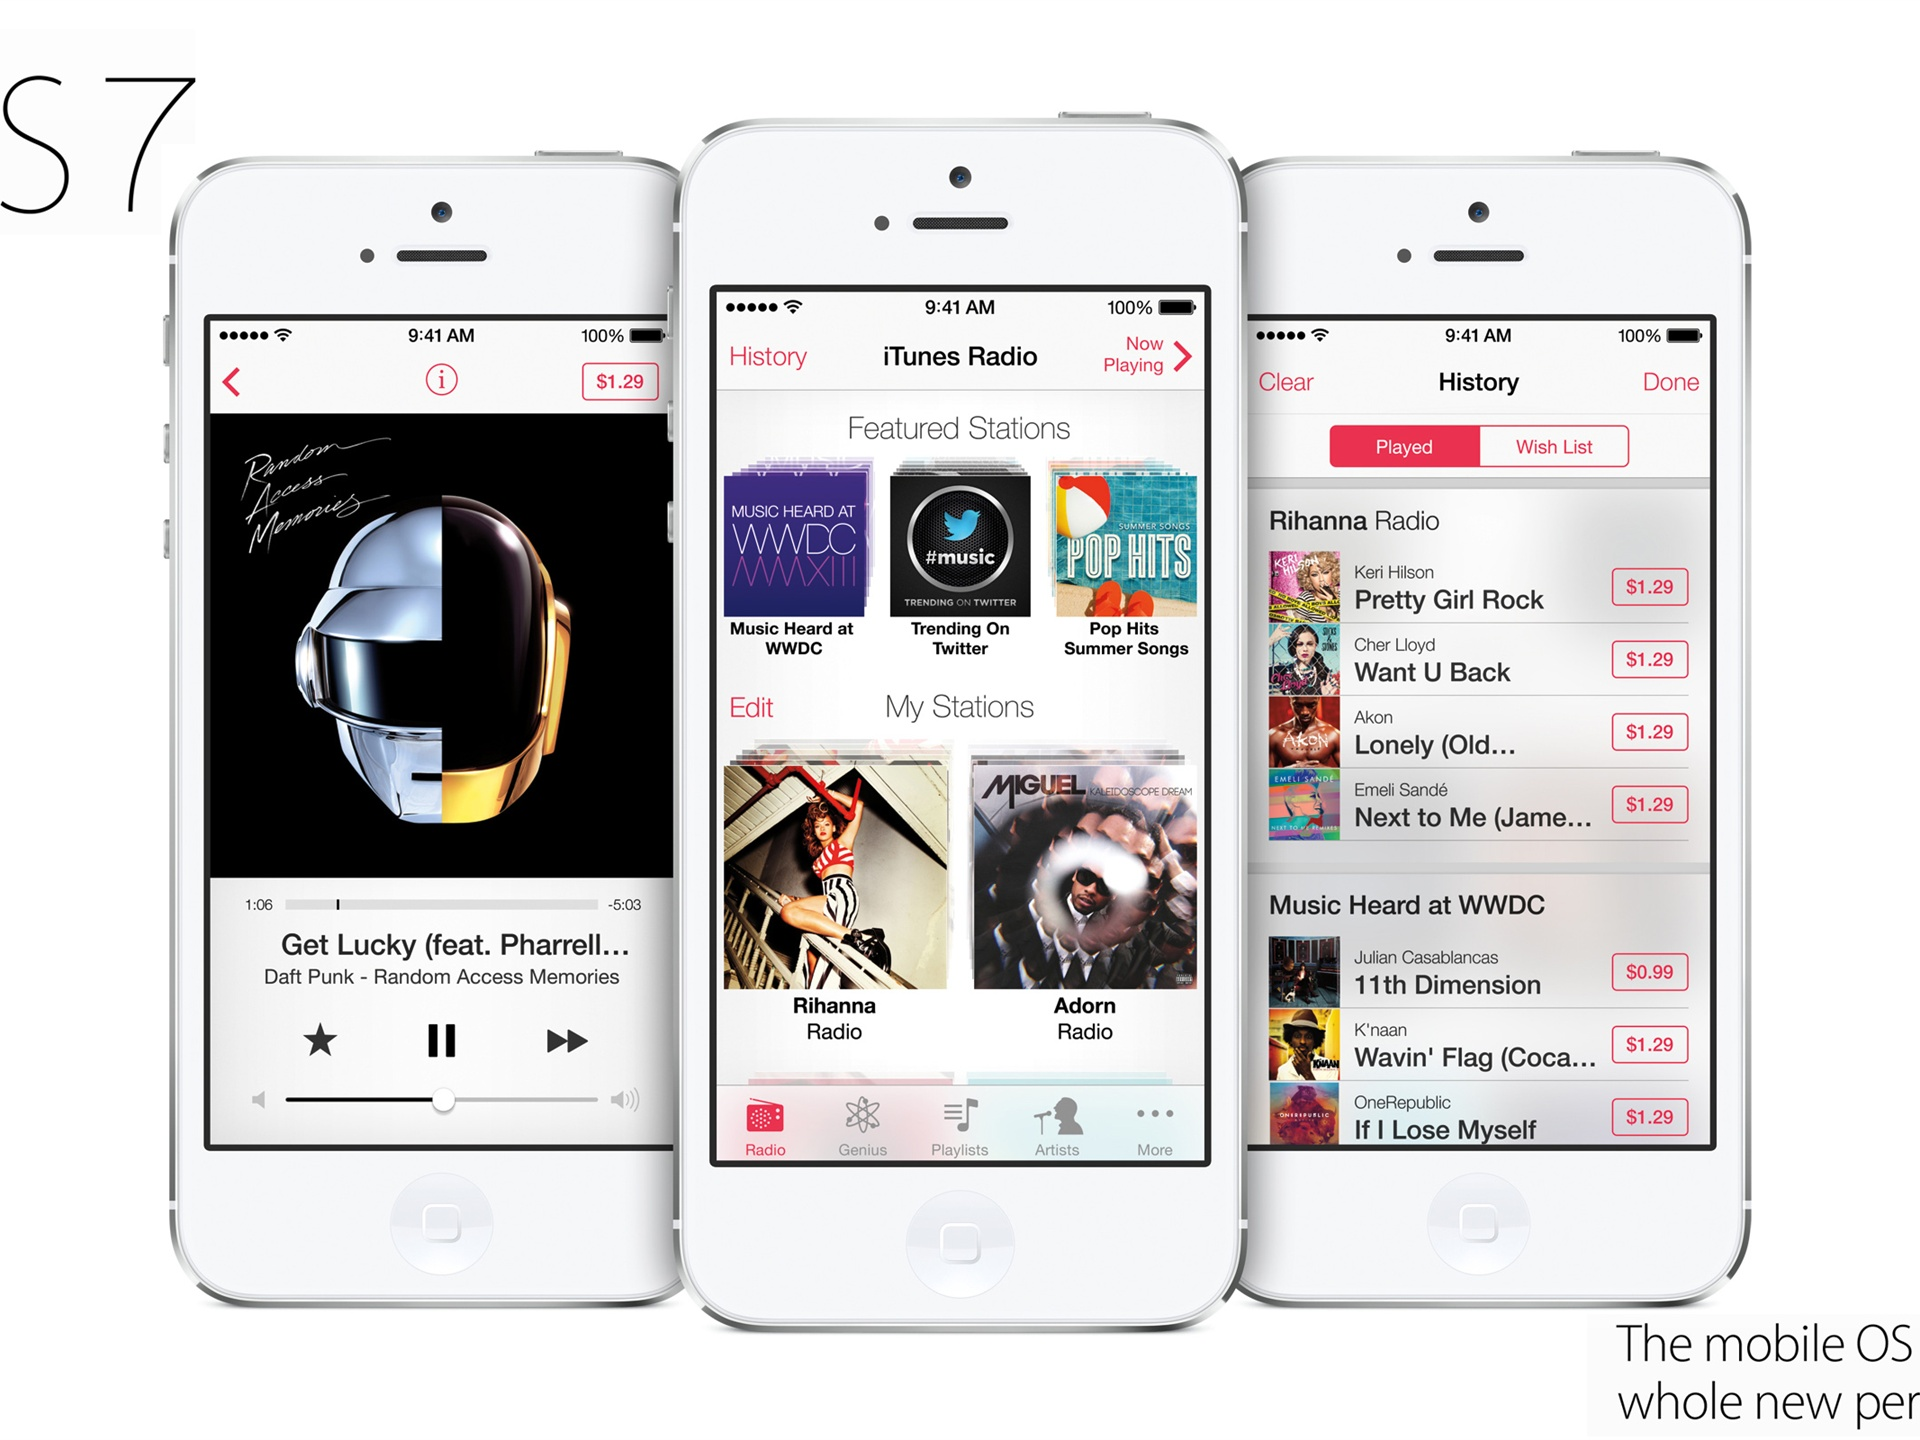 Wallpaper iPhone 5 iTunes Radio in iOS 7 system 2560x1600 HD